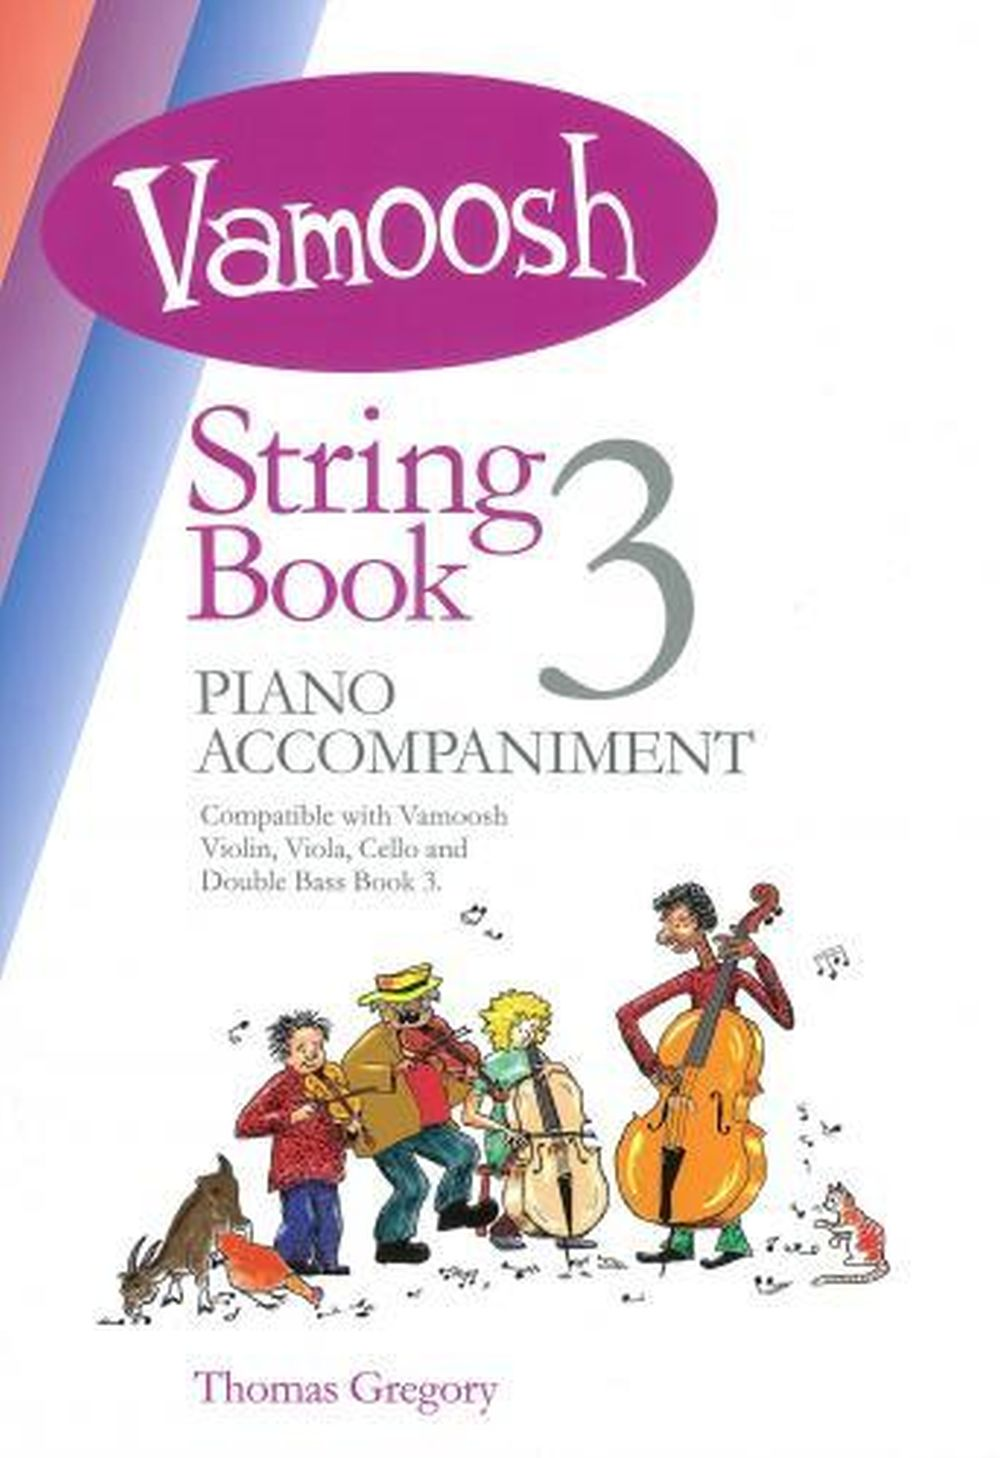 Thomas Gregory: Vamoosh String Book 3 Piano Accompaniment: Piano Accompaniment: